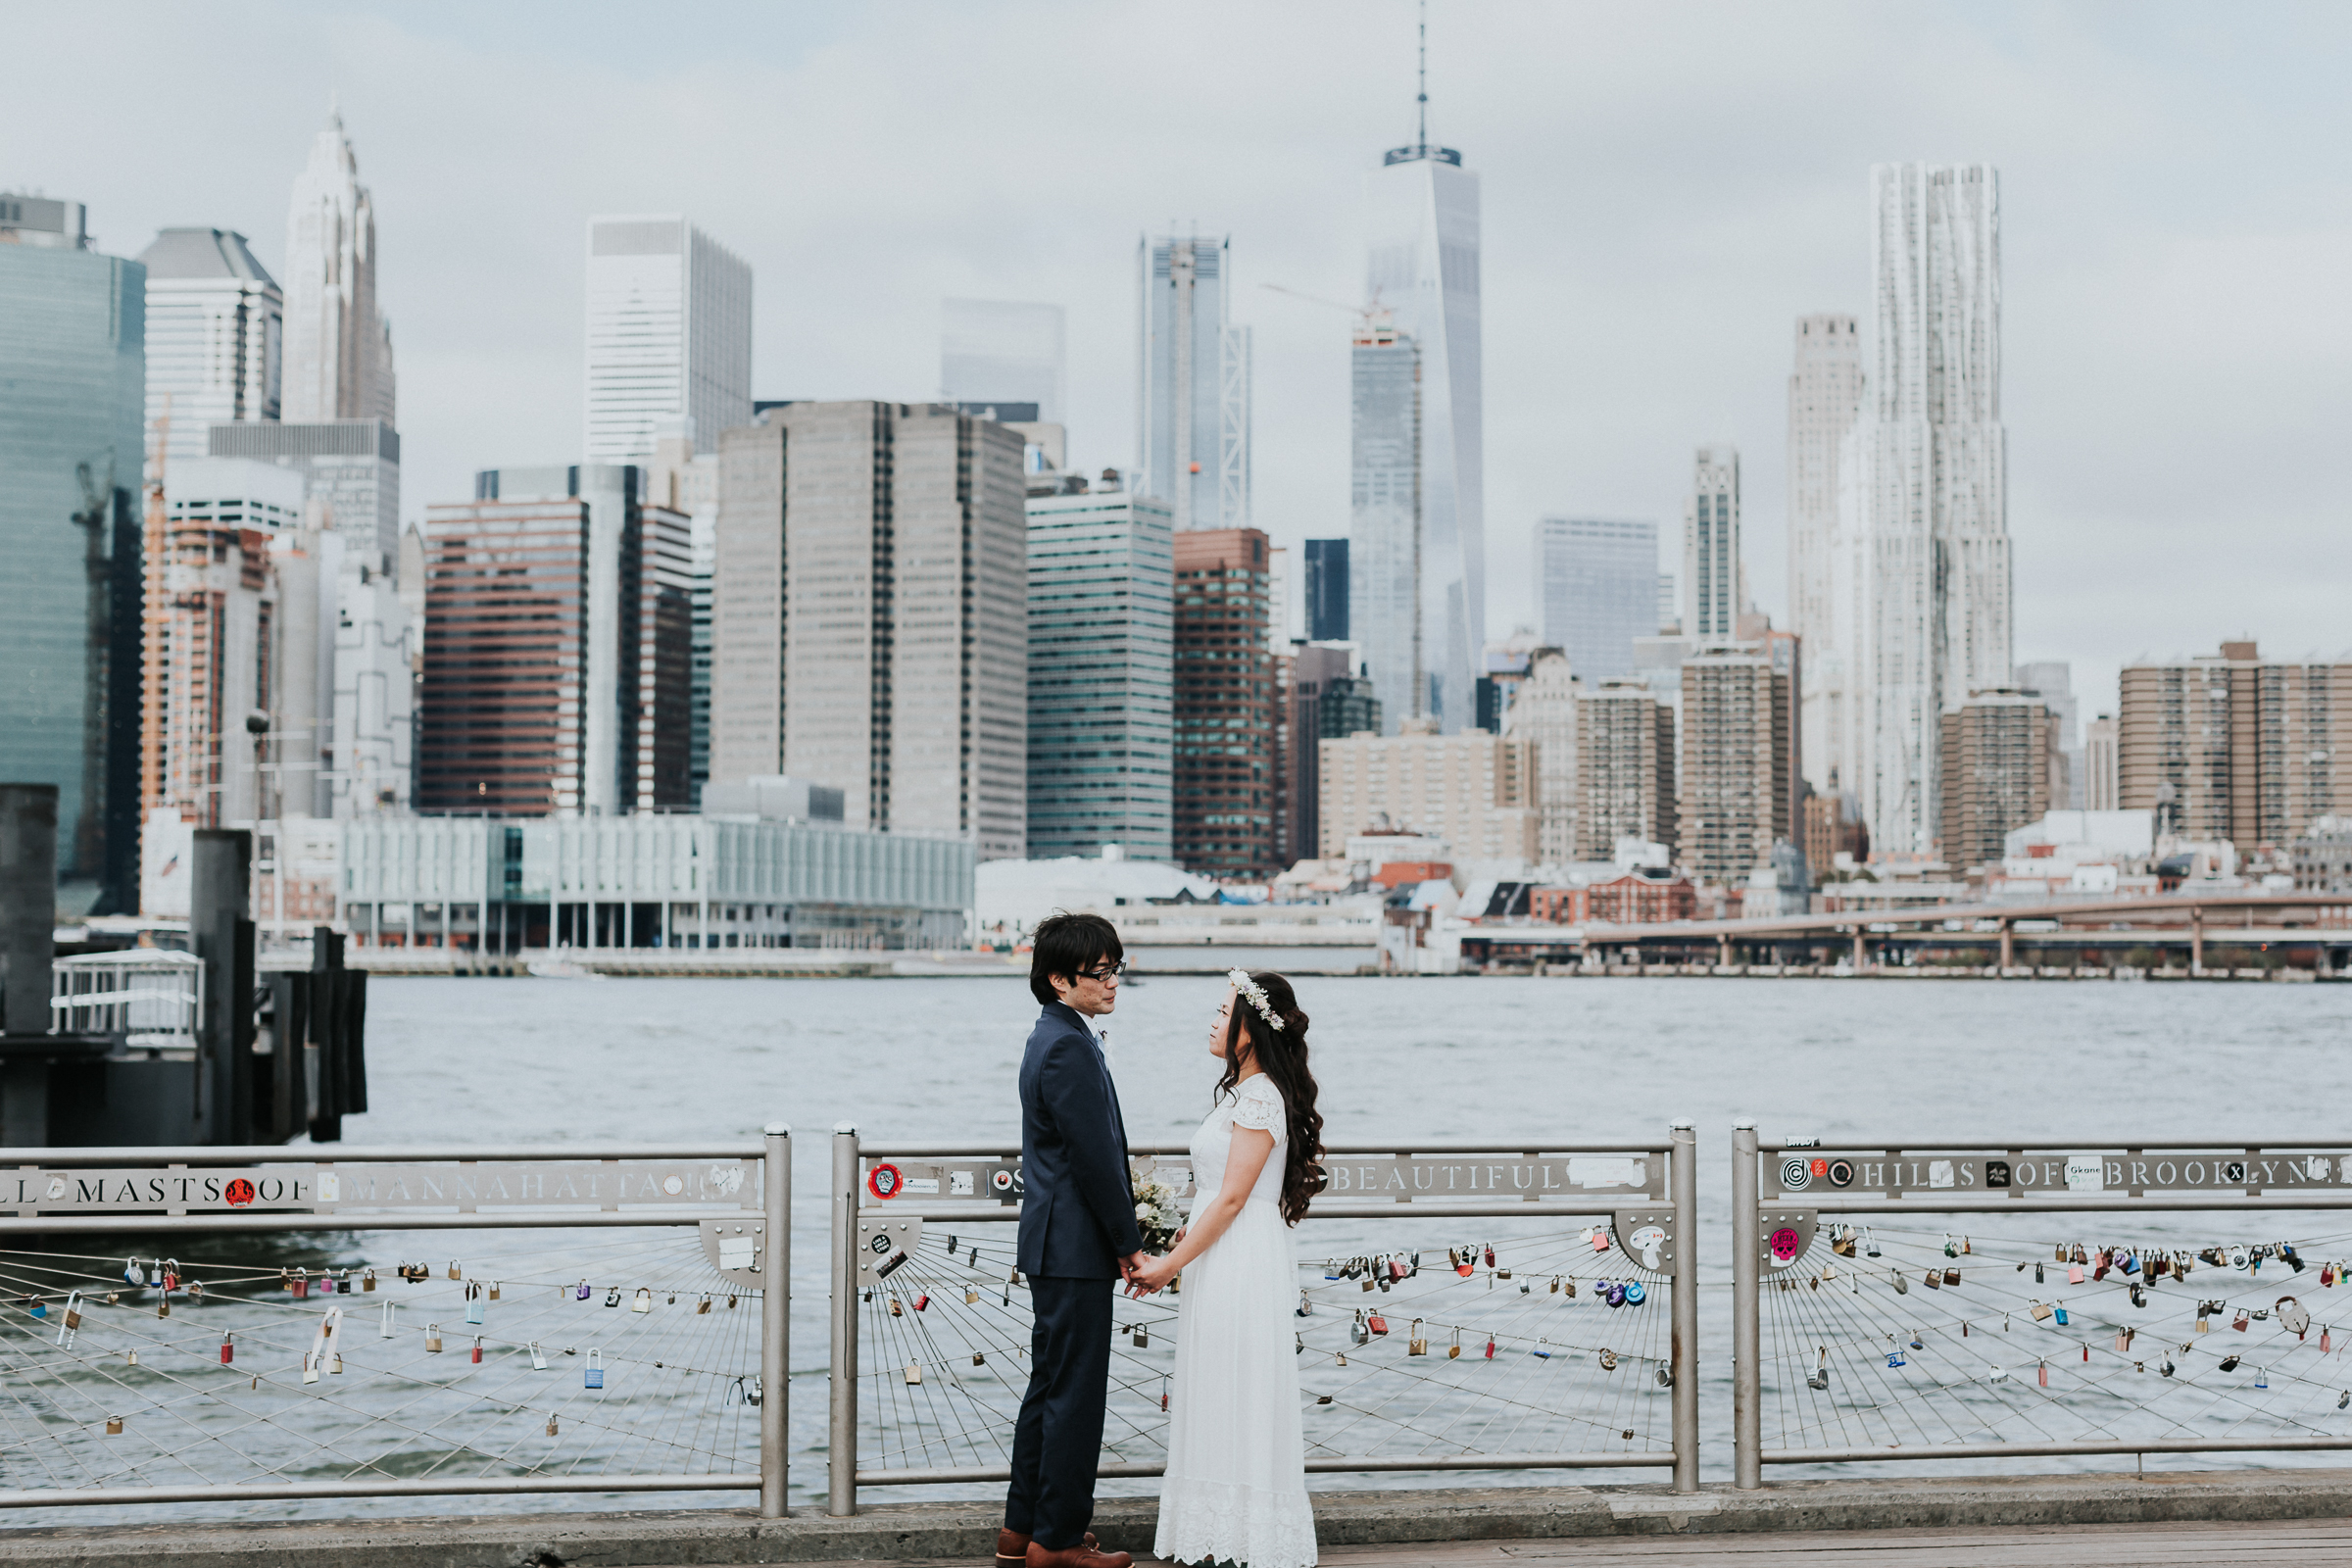 Central-Park-Brooklyn-Bridge-Dumbo-NYC-Documentary-Wedding-Photographer-22.jpg